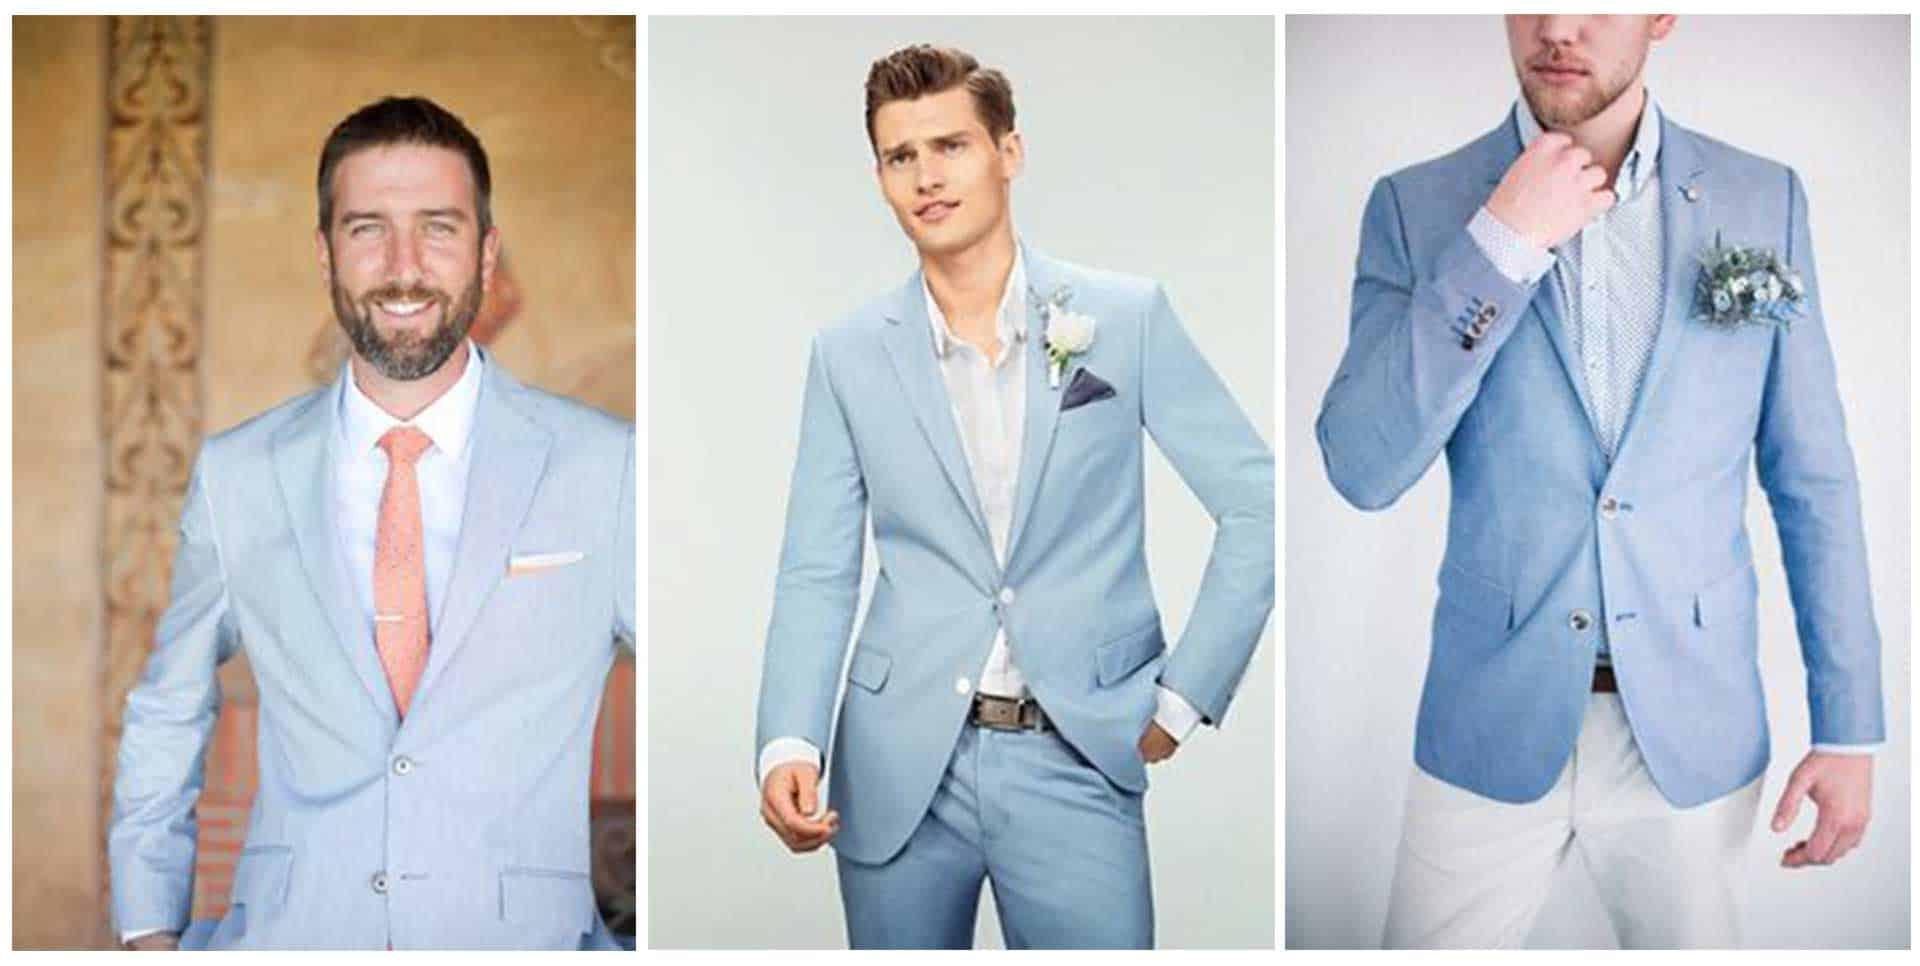 Contemporary Wedding Suit Color Crest - All Wedding Dresses ...